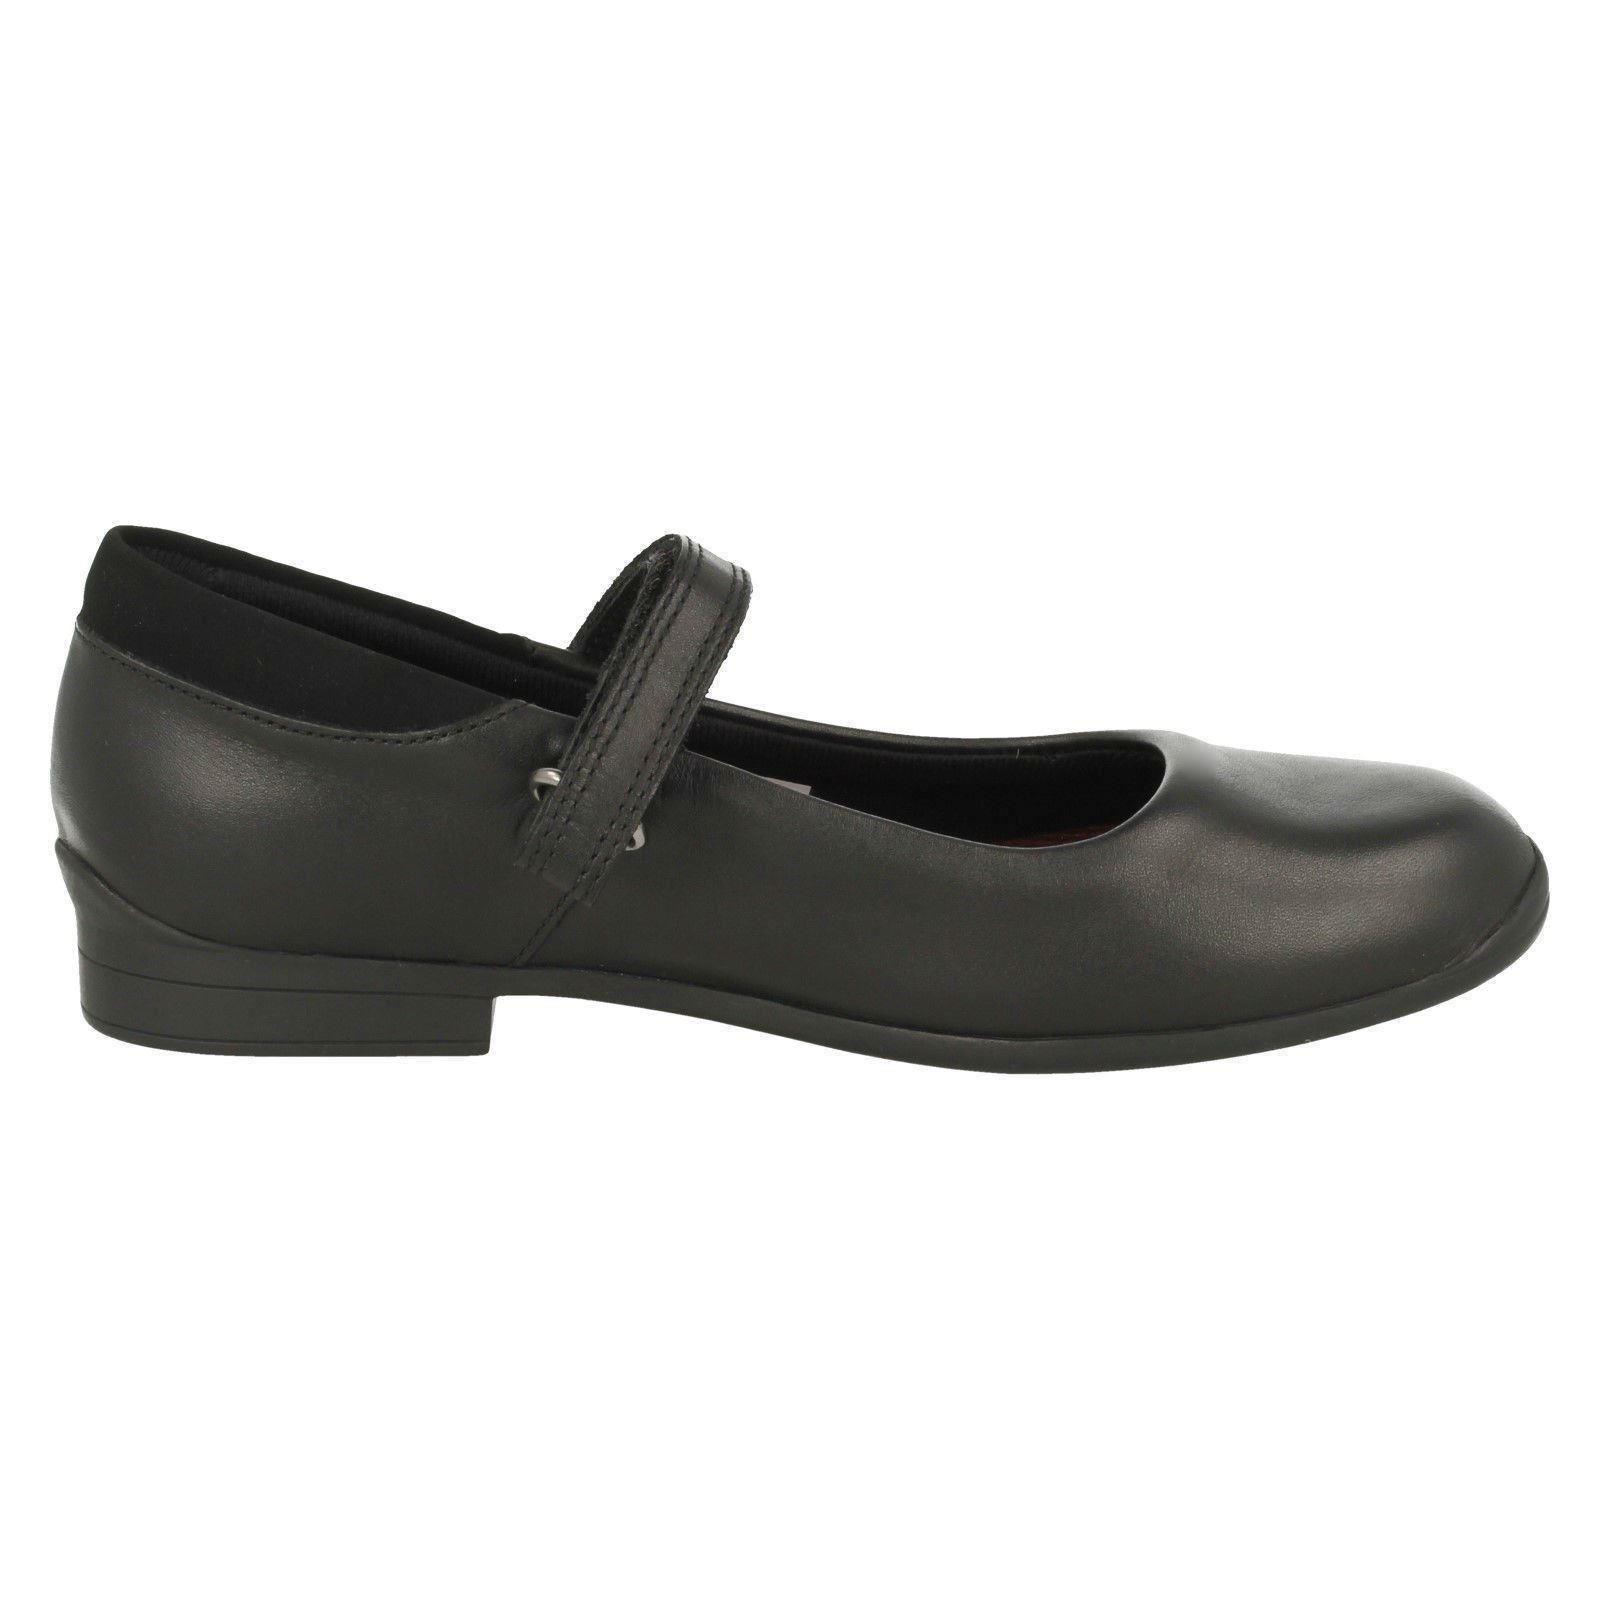 Girls Clarks Rounded Toe Hook /& Loop Leather School Shoes Jamie Star